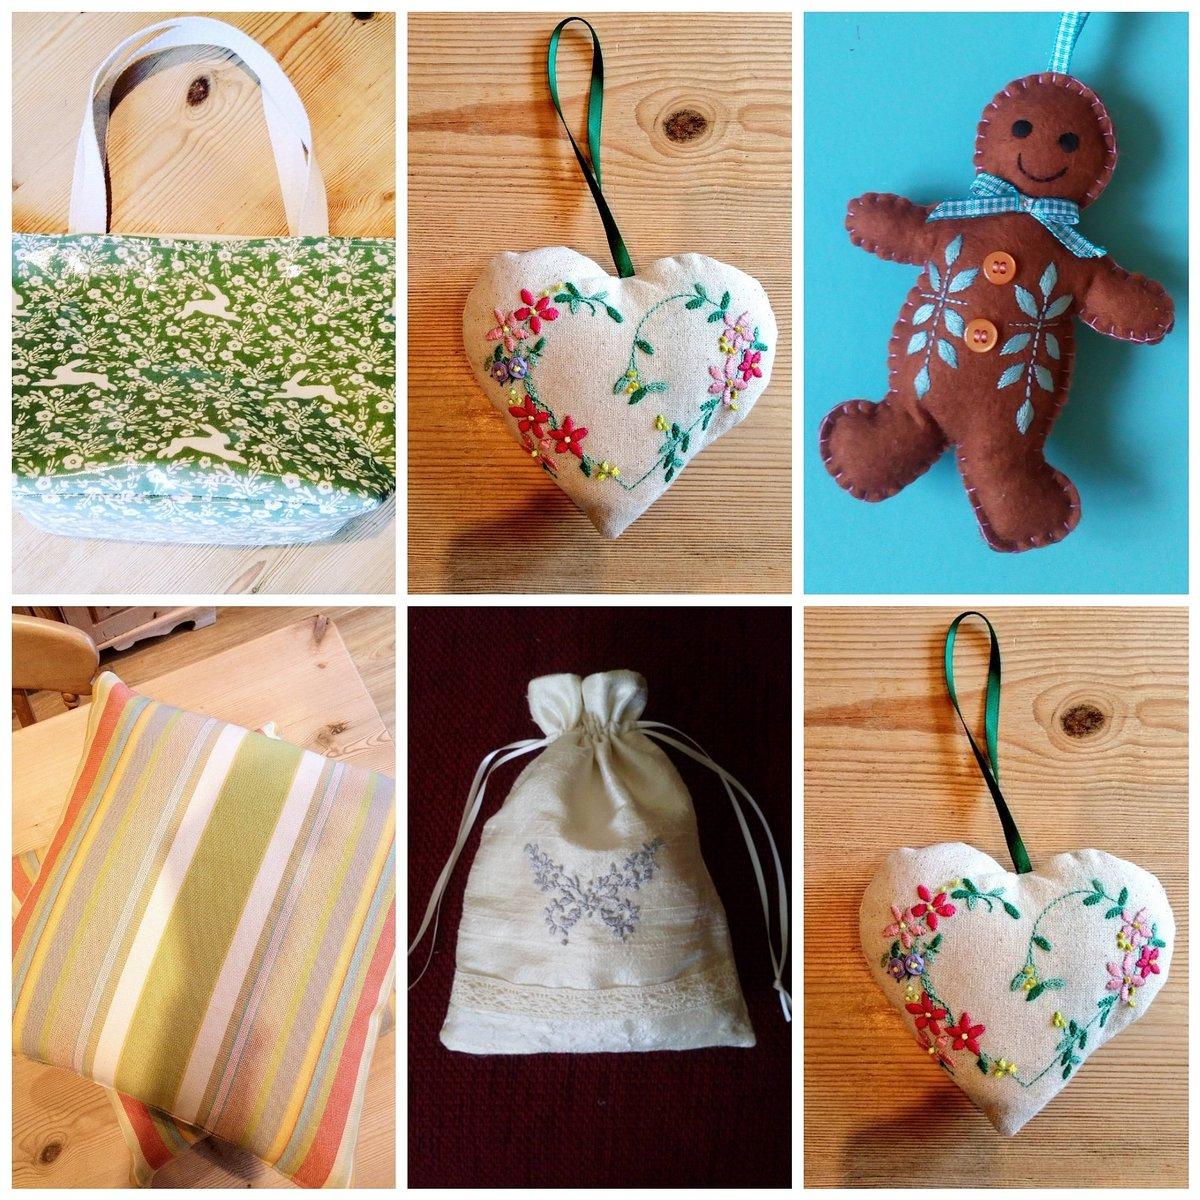 Dolly Orange Gift & Home Visit our online store at  http:// dollyorange.co.uk     #GiftIdeas #handmadehour #handmadewithlove #homedecor #UKSmallBiz #ukcraft #UKGiftHour #Uksopro #marketformakers<br>http://pic.twitter.com/sdsiJBPp55